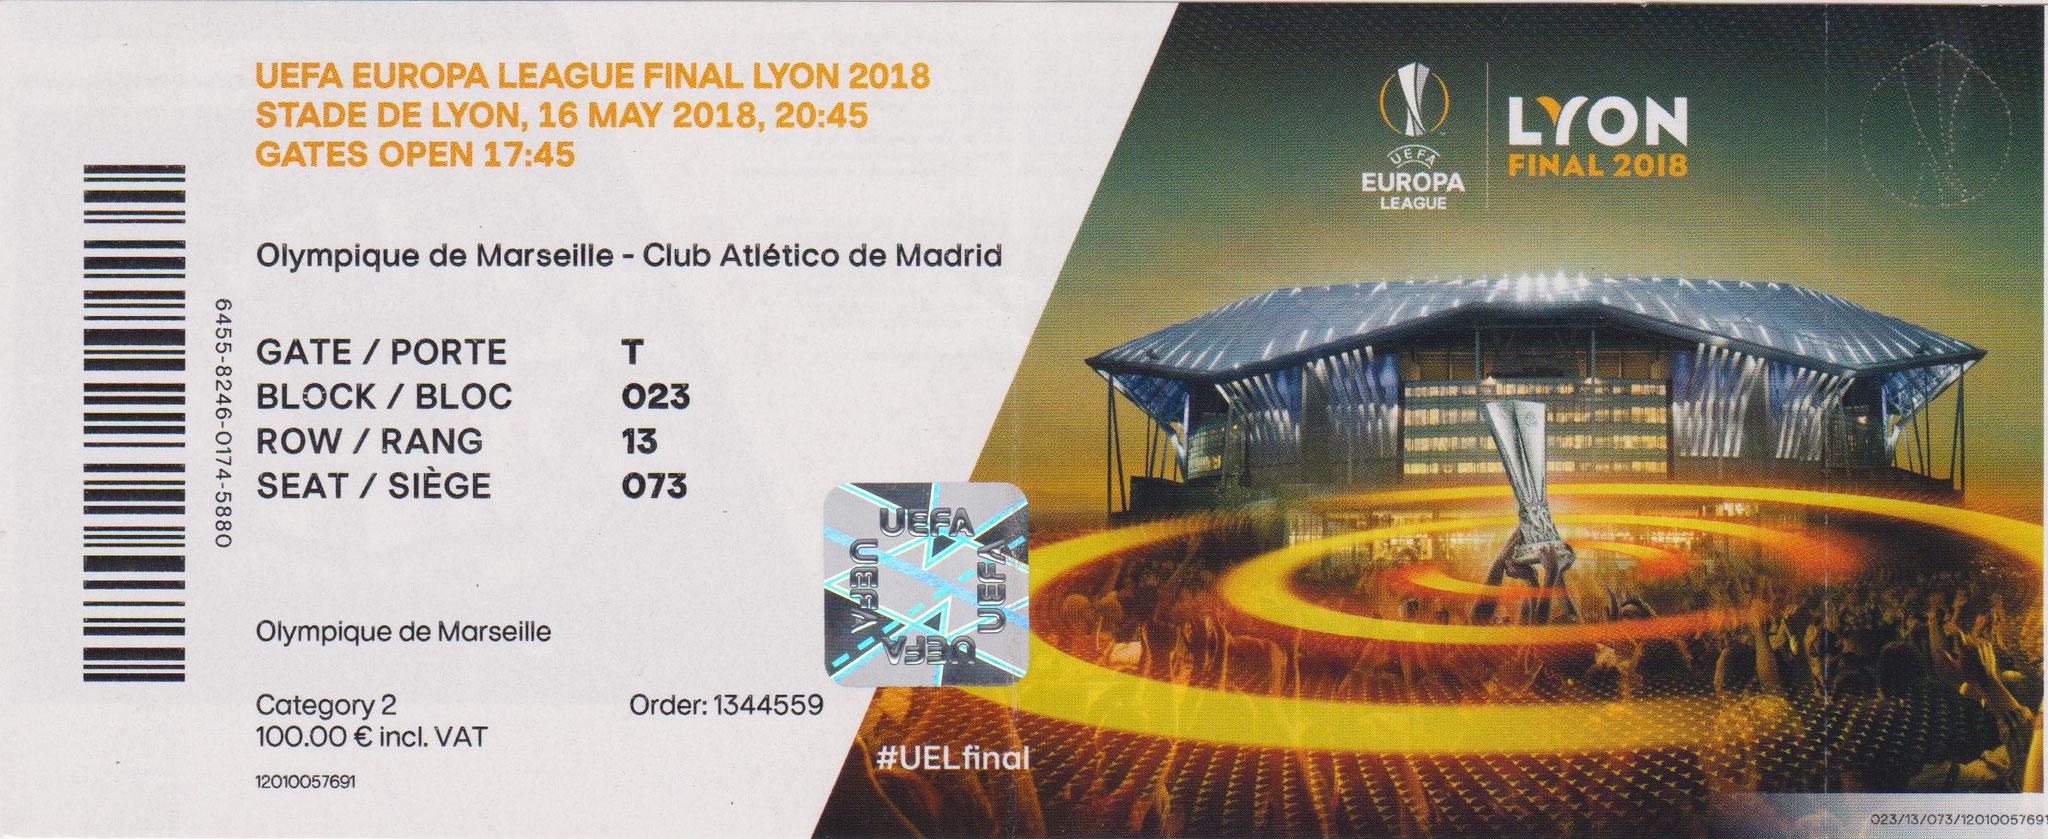 2018 à Lyon :  Athletico Madrid - Olympique Marseille  3 - 0